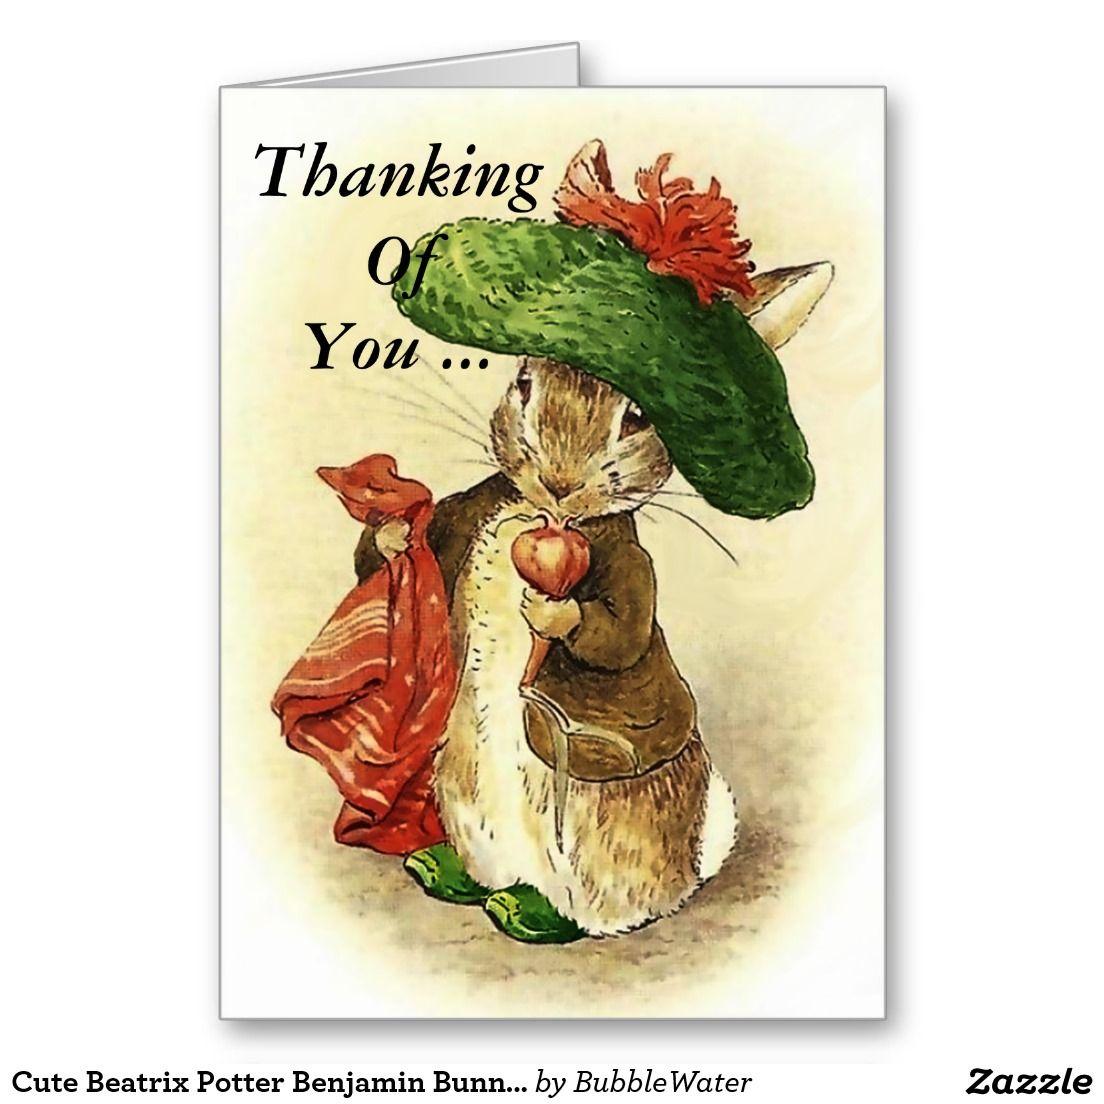 Cute Beatrix Potter Benjamin Bunny Greeting Card | Bunny